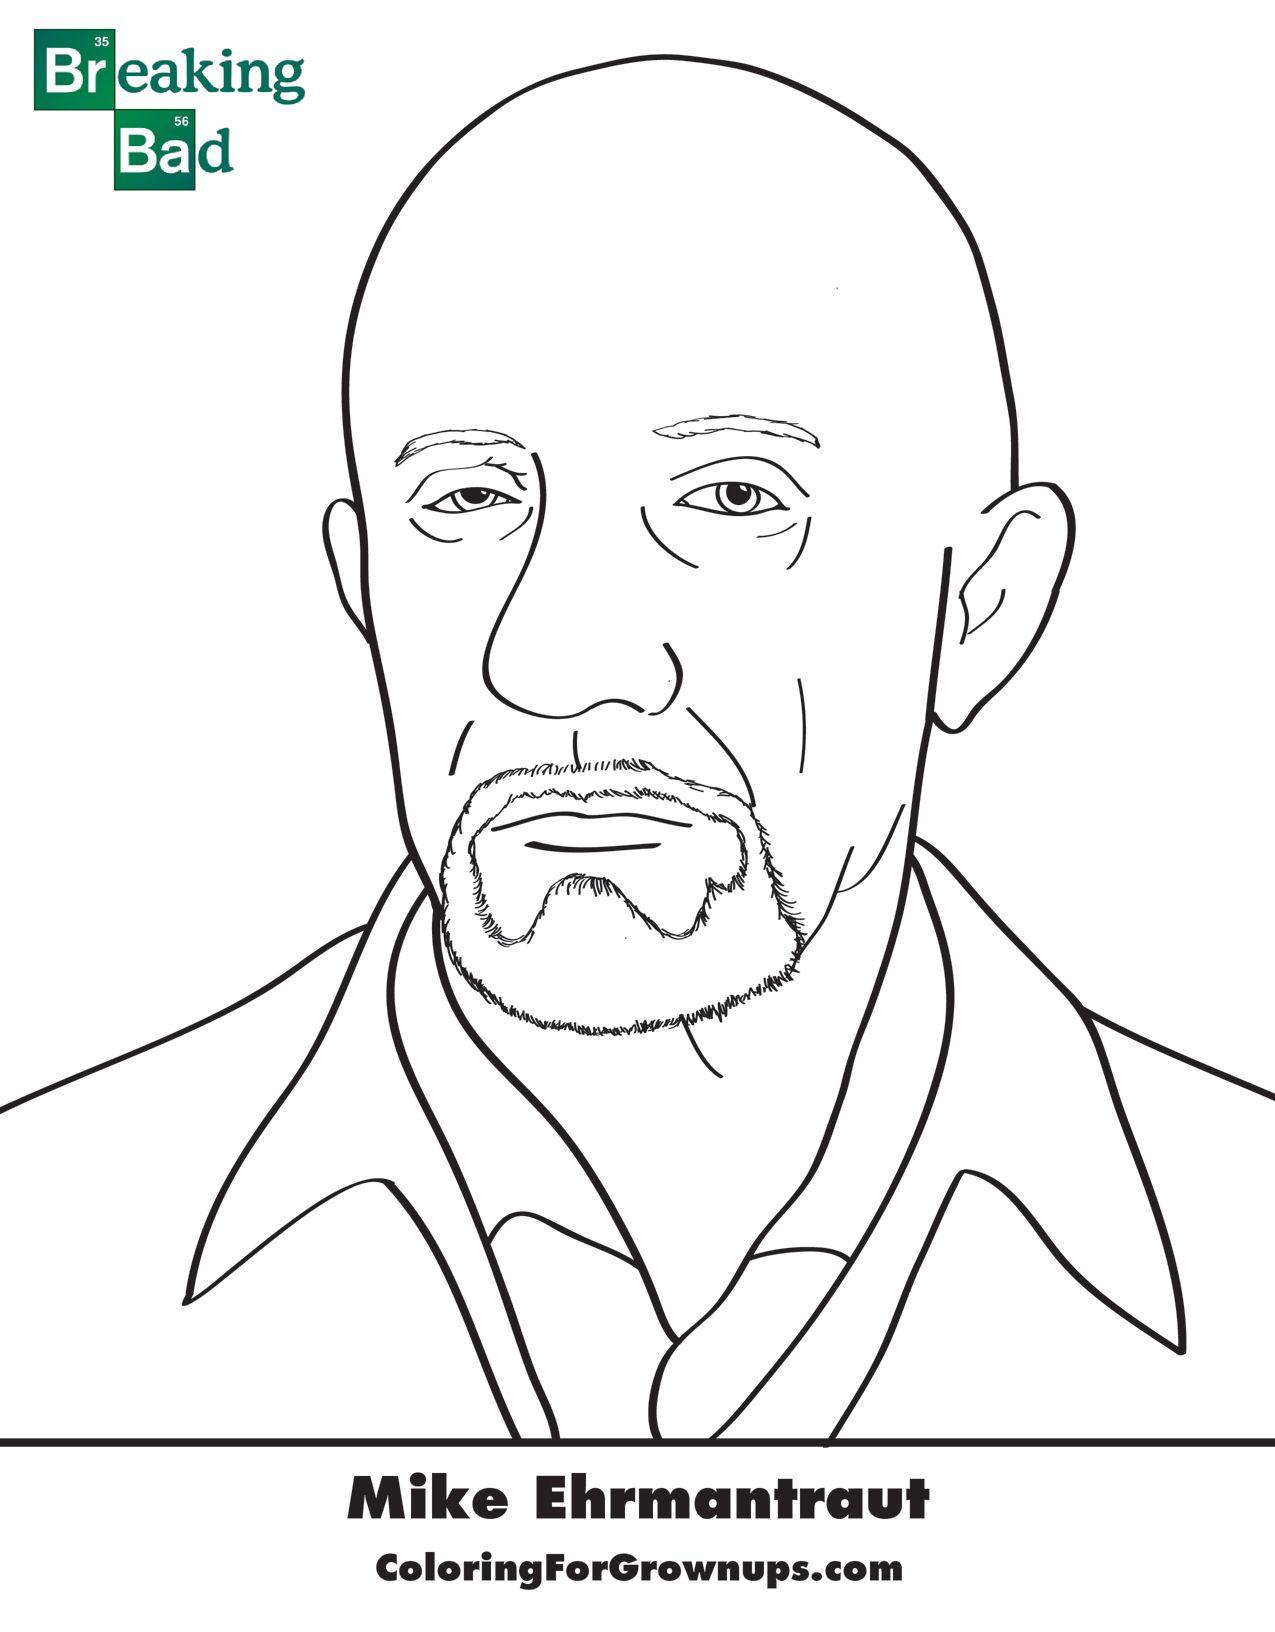 Breaking Bad Coloring Page (Coloringforgrownups.com